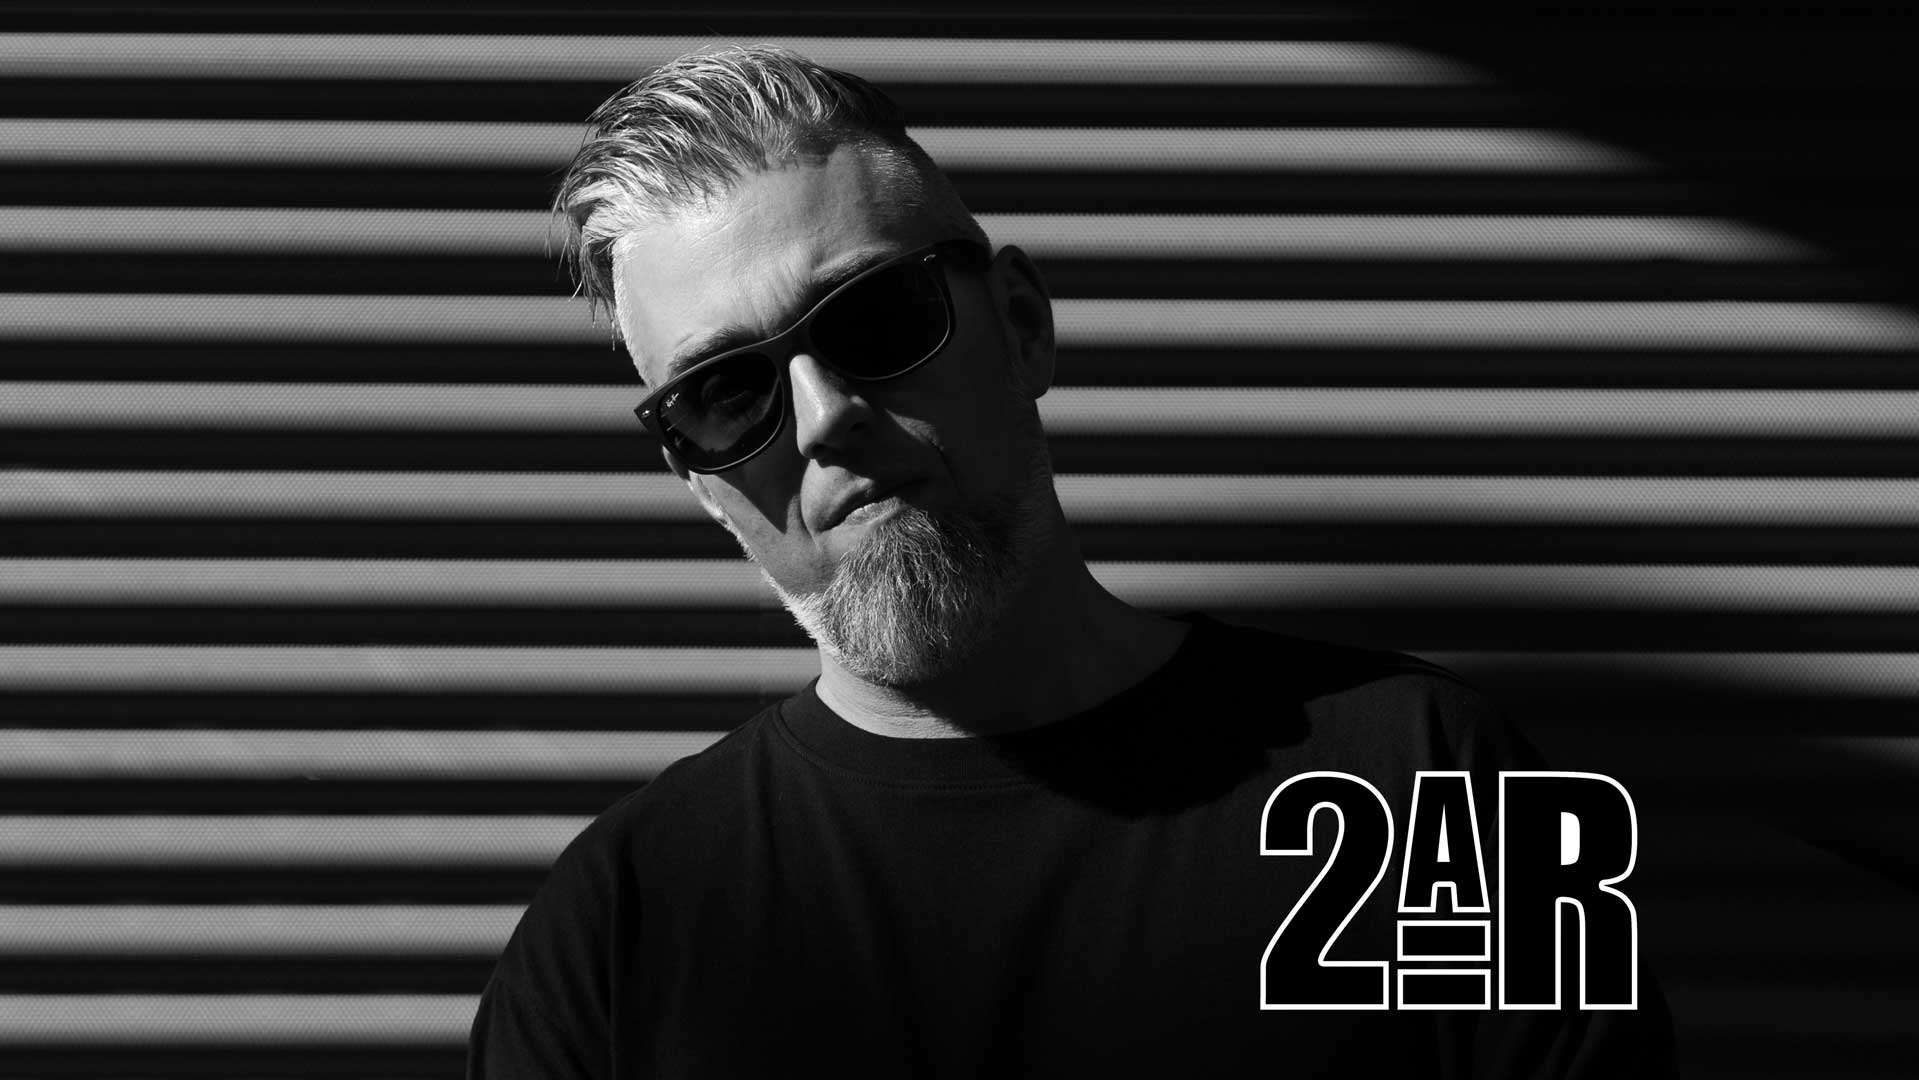 DJ2AR for Spring Break 2020